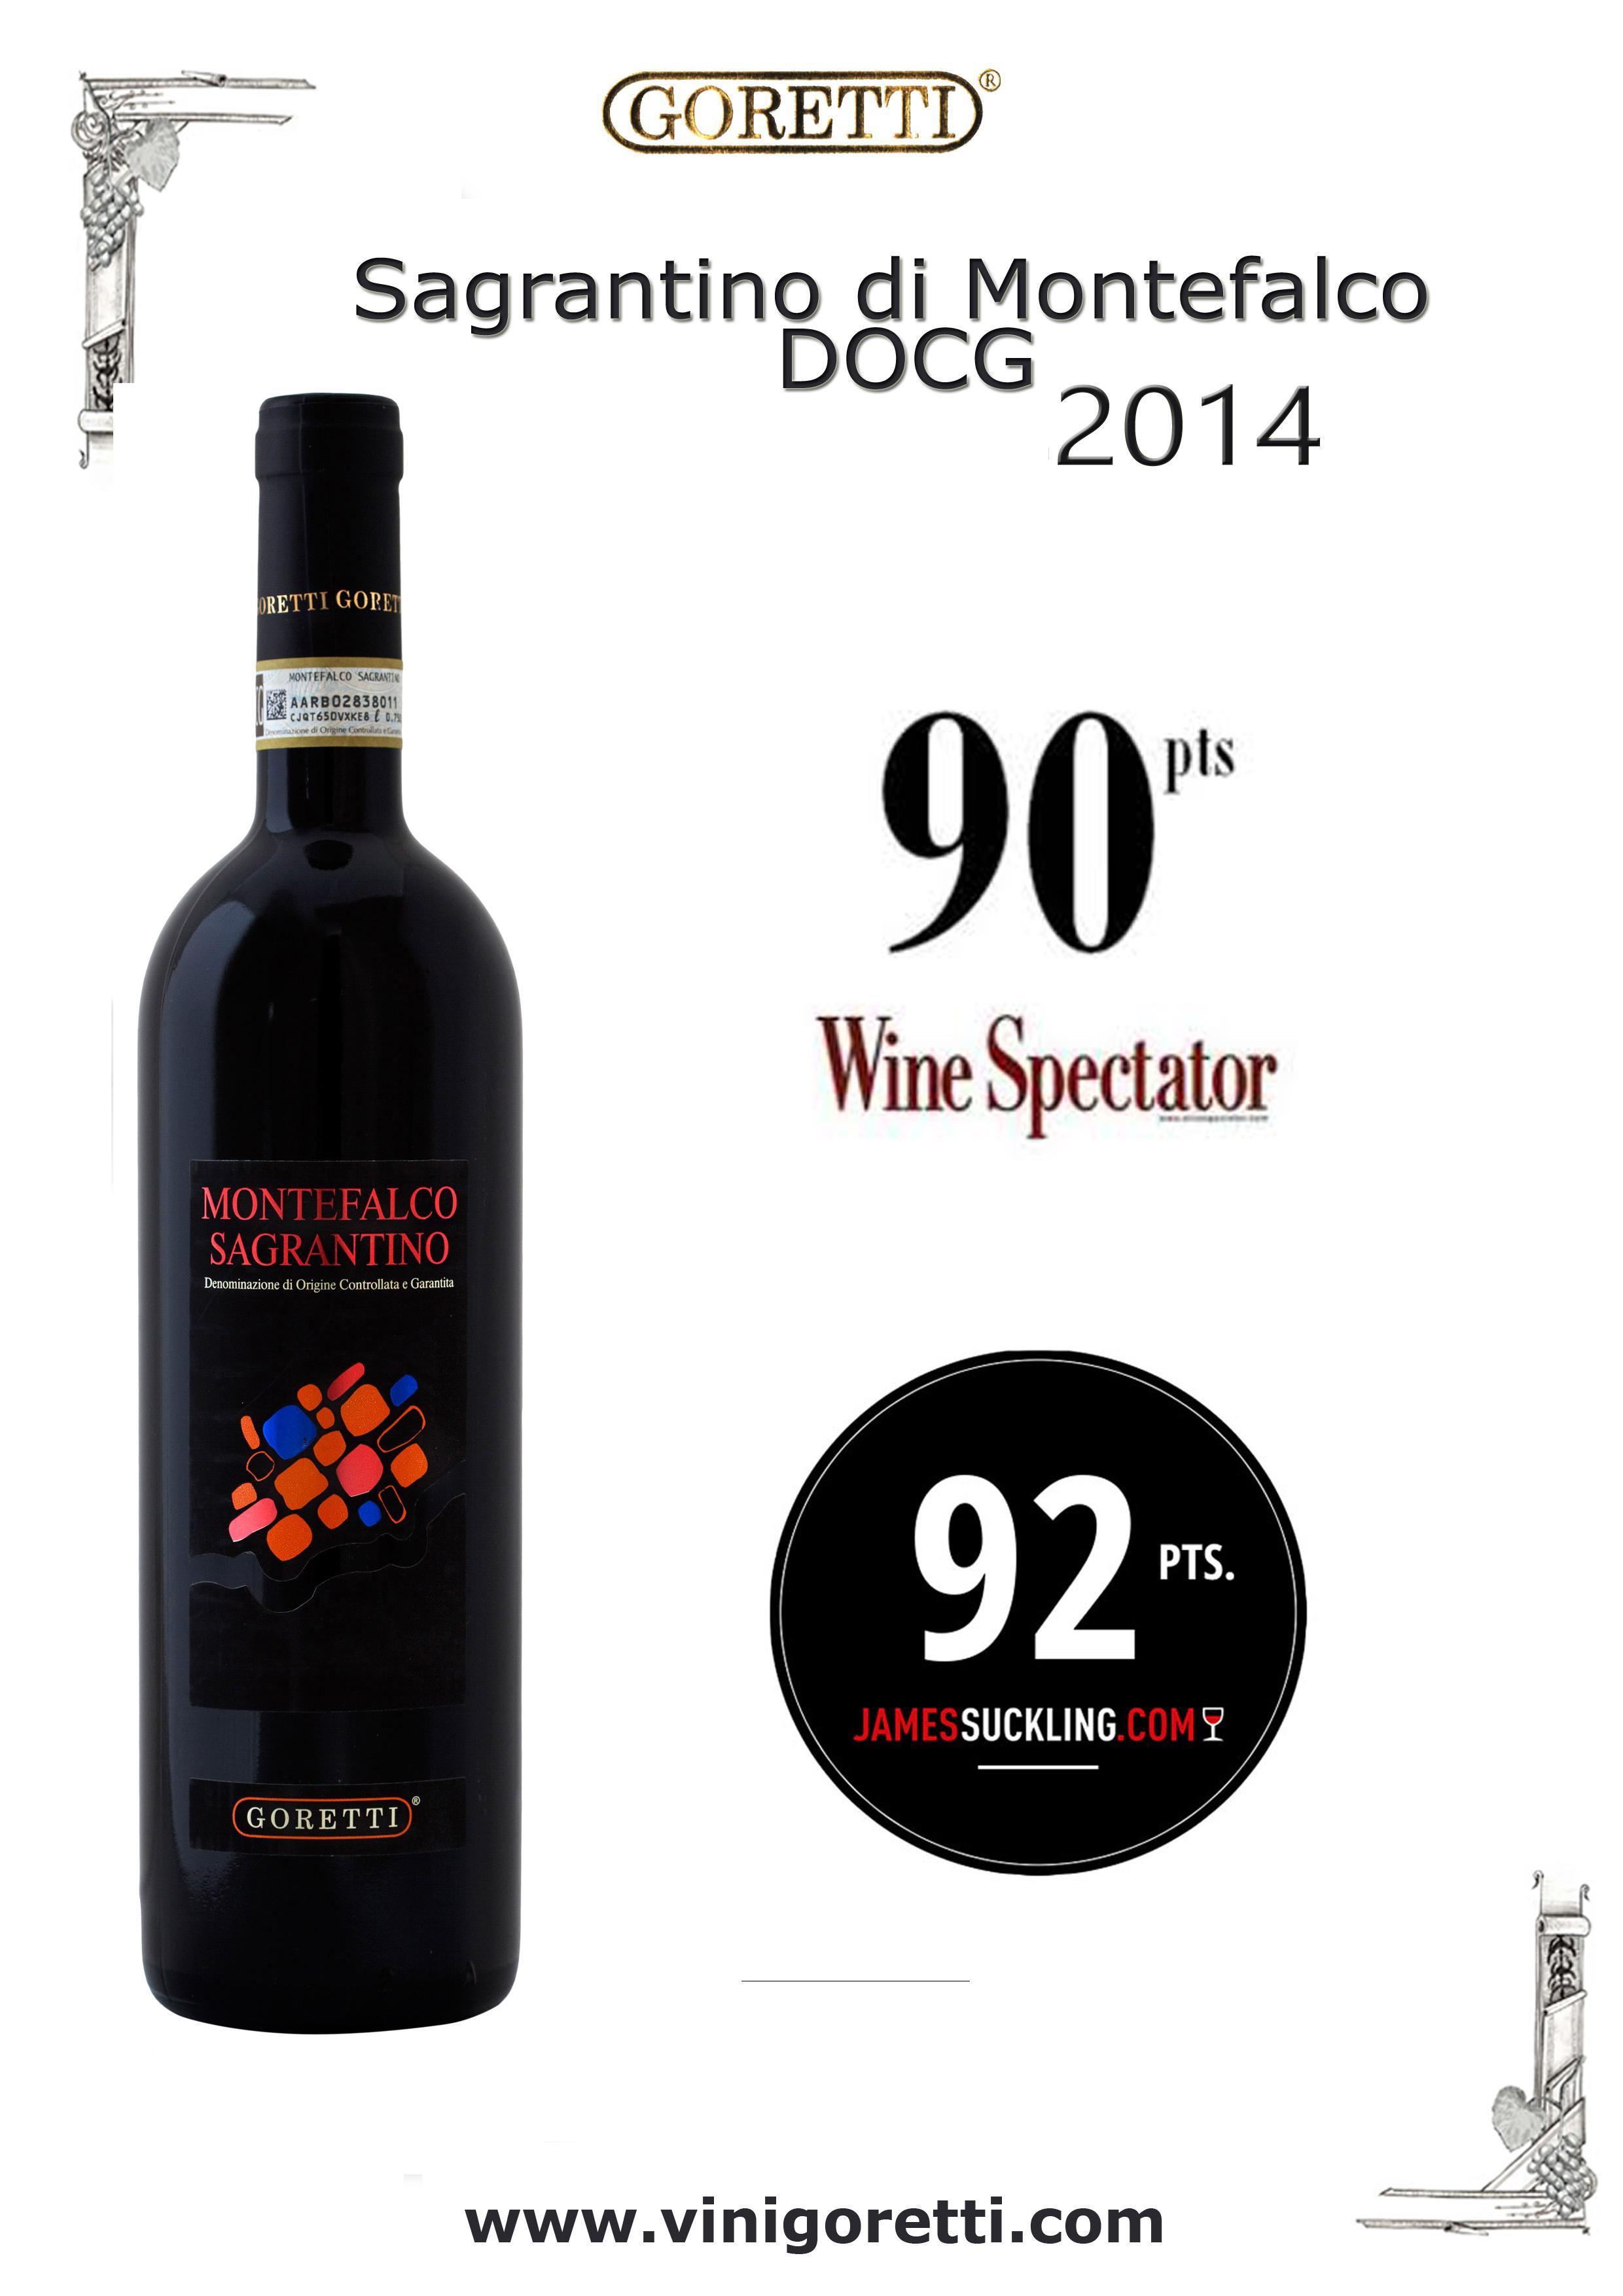 Sagrantino Montefalco DOCG 2014